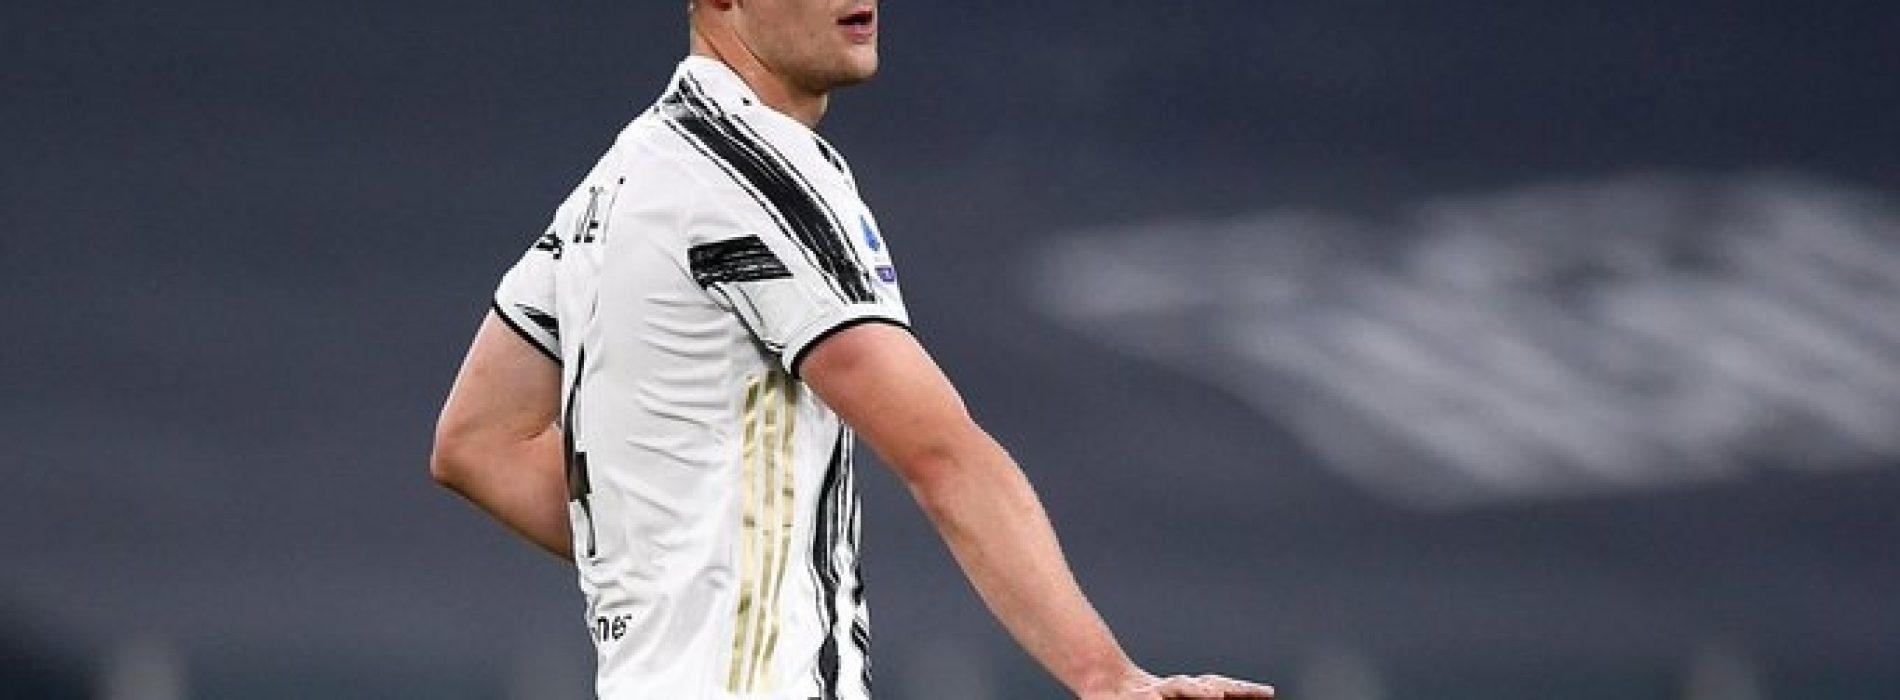 "Juve de Ligt: ""Con Pirlo calcio più moderno, come quando ero all'Ajax"""